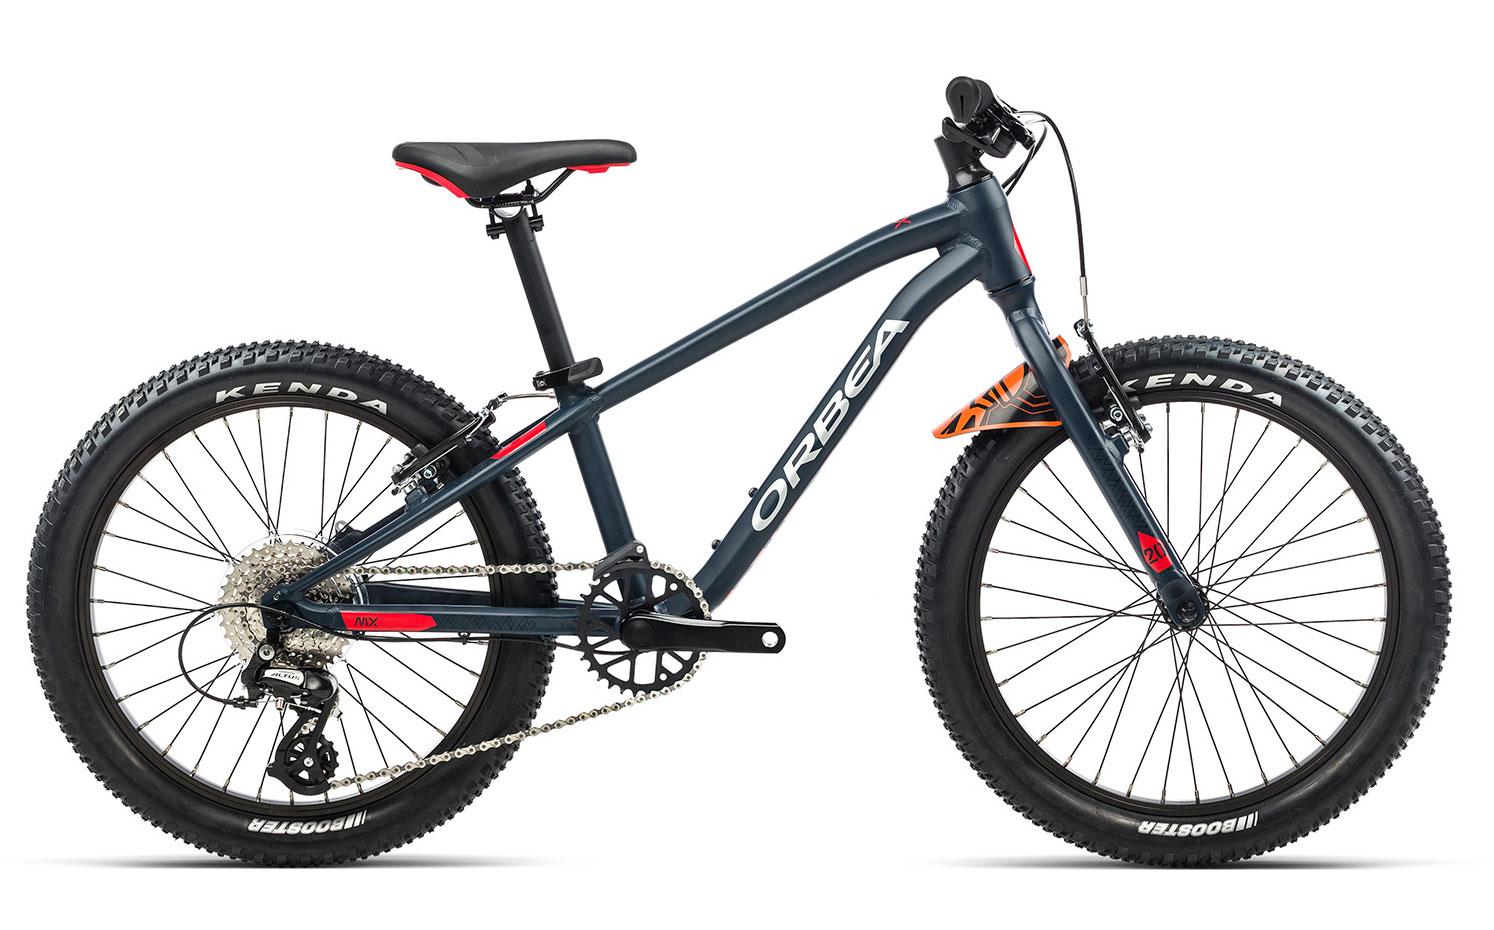 Bicicleta kids Orbea MX 20 TEAM - Azul-Vermelha 2021